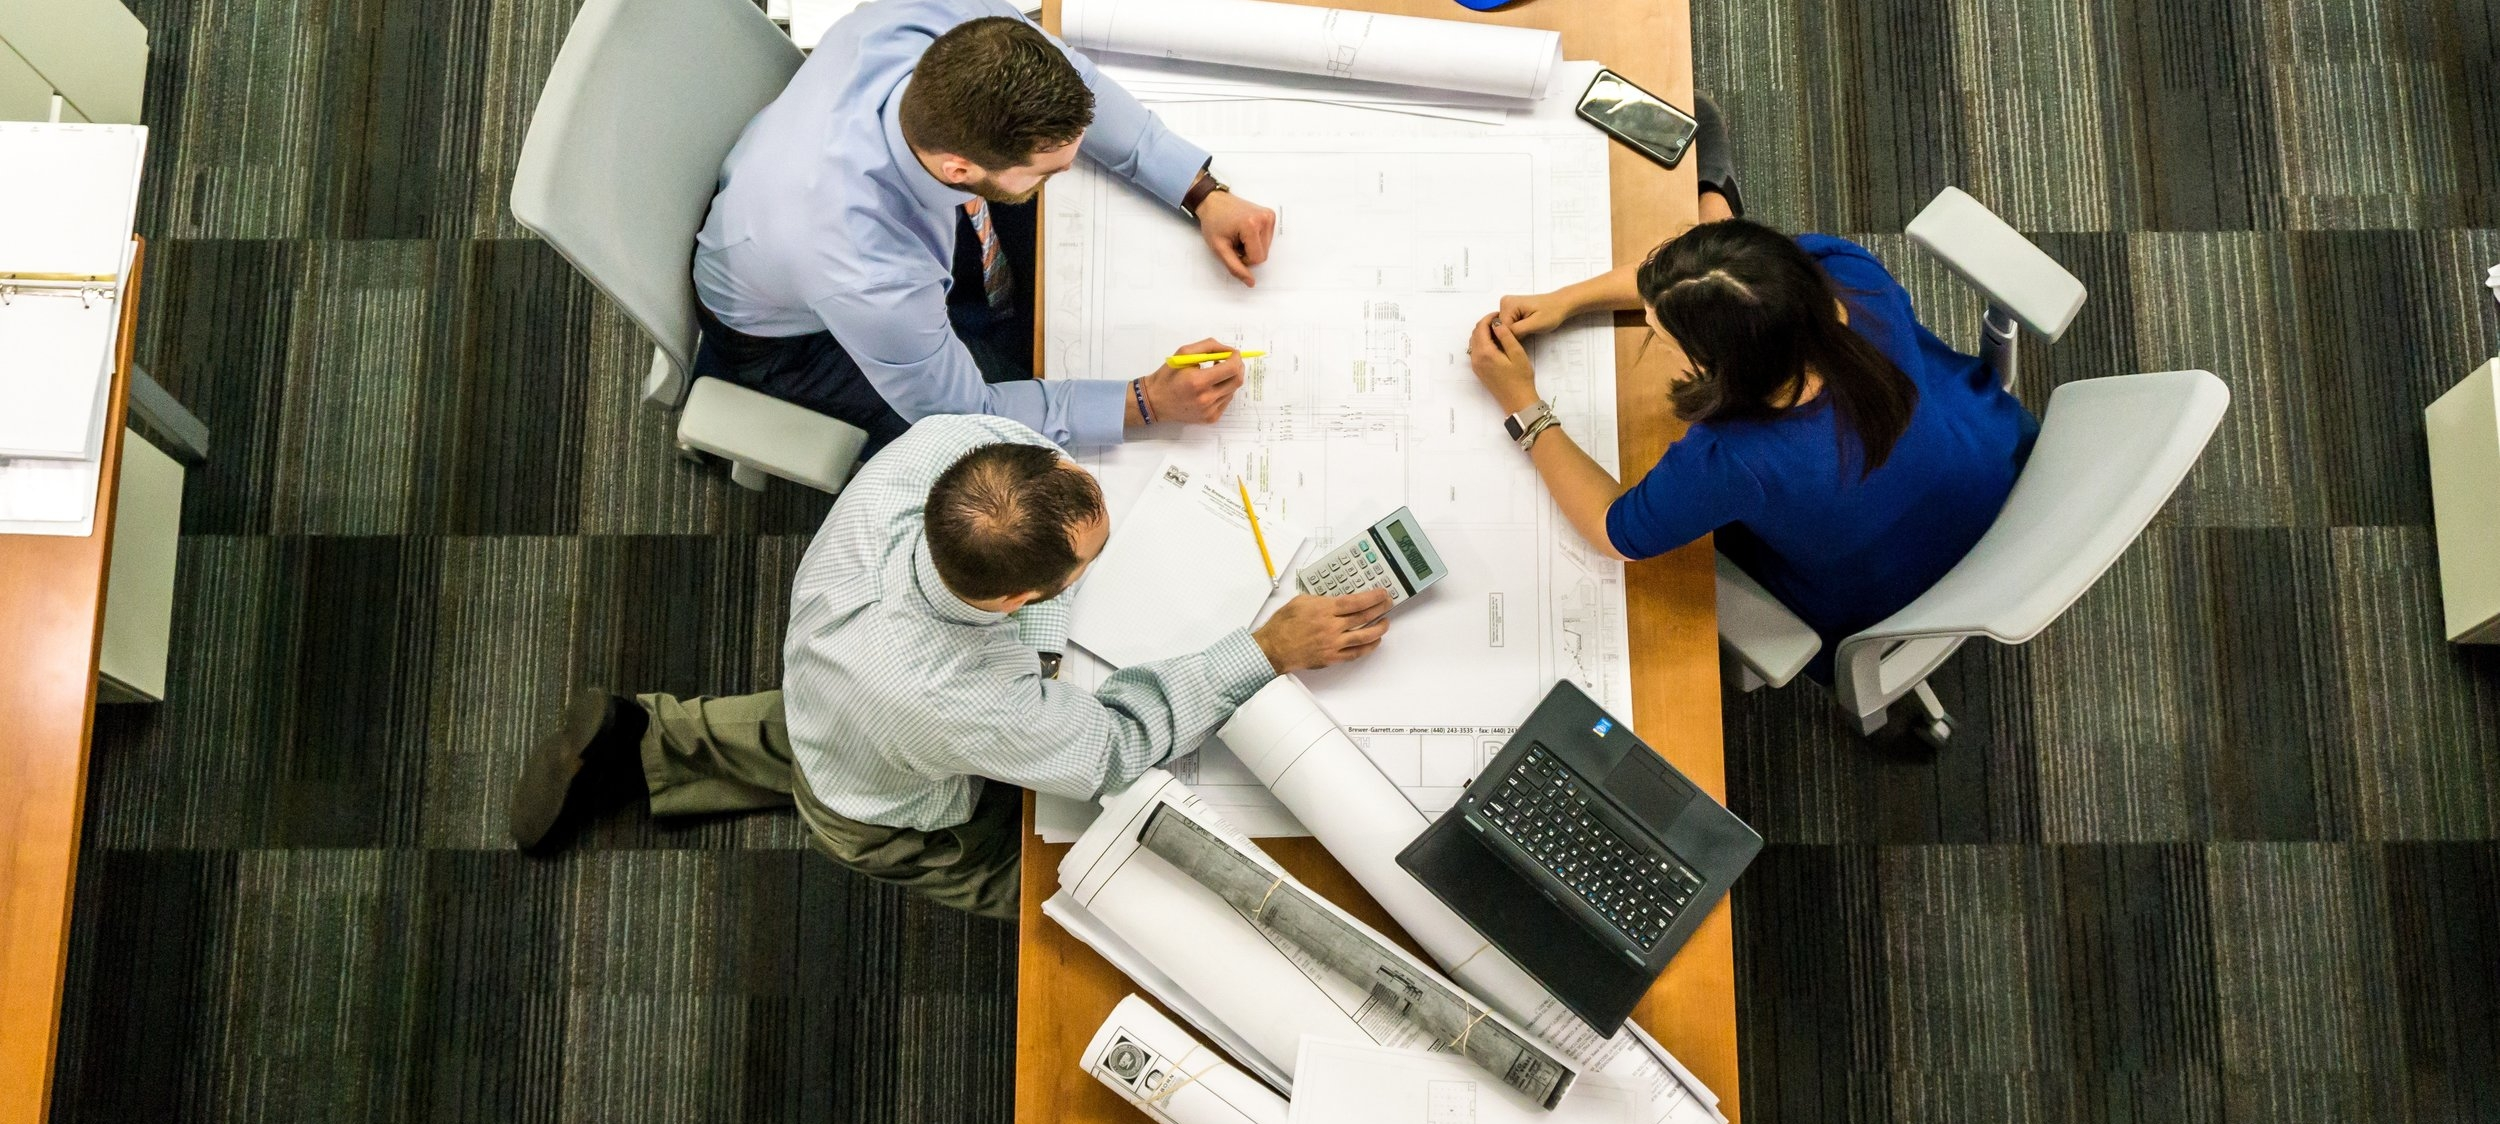 workplace-strategy-architect-blueprint-416405.jpg